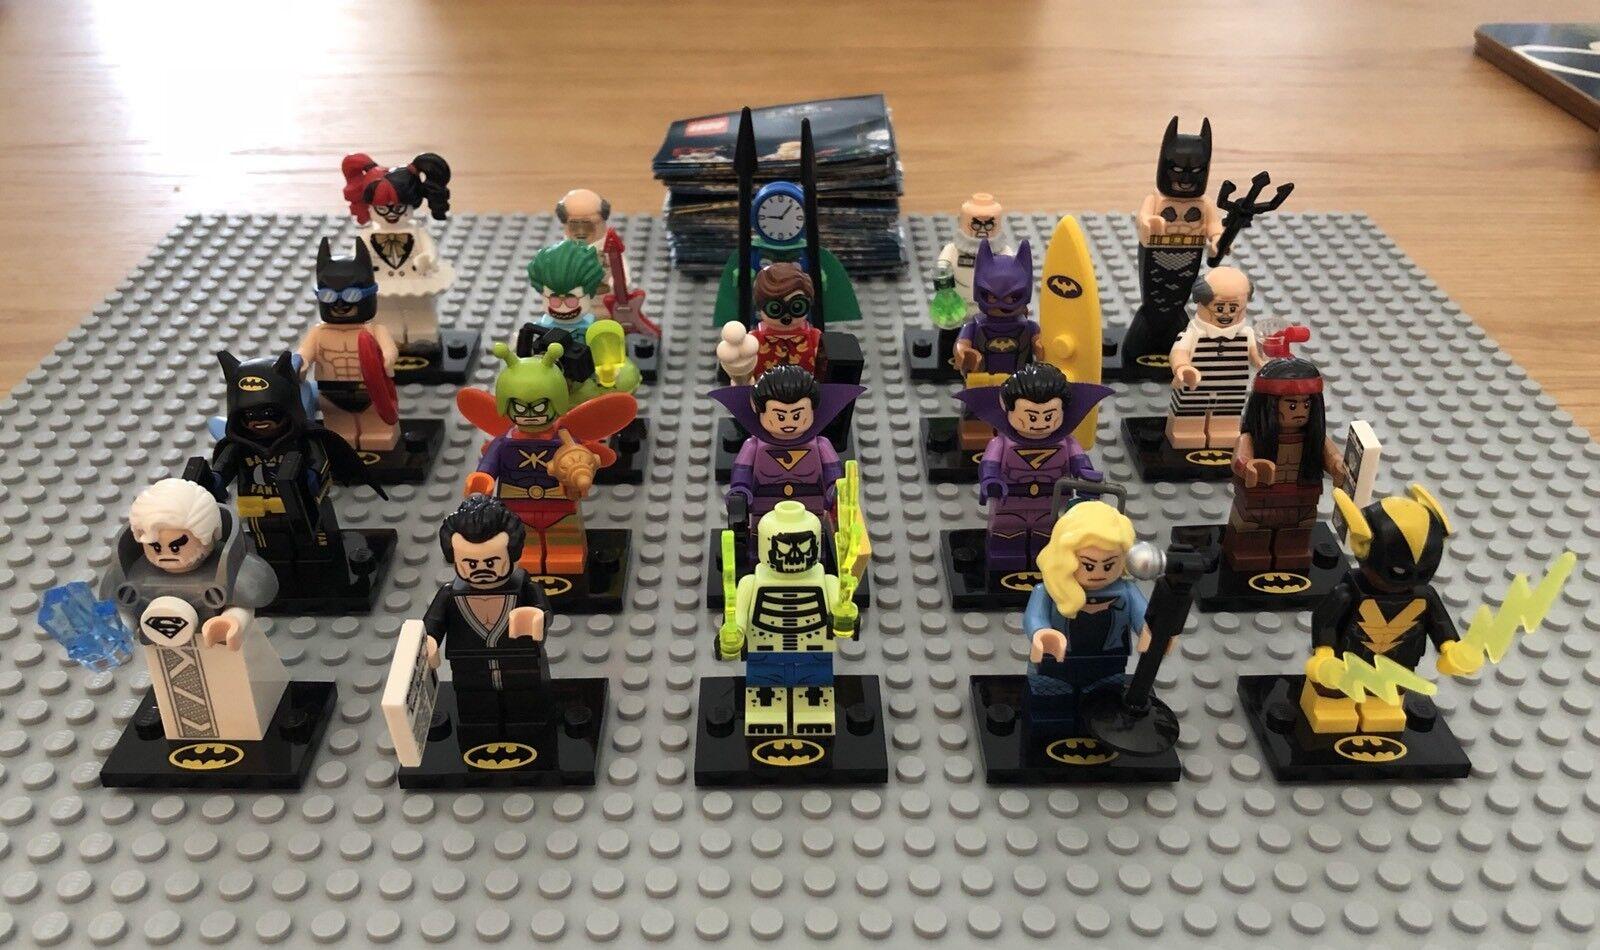 LEGO Batman Movie Series 2 Minifigures 71020 Complete Set. Brand New. Boxed